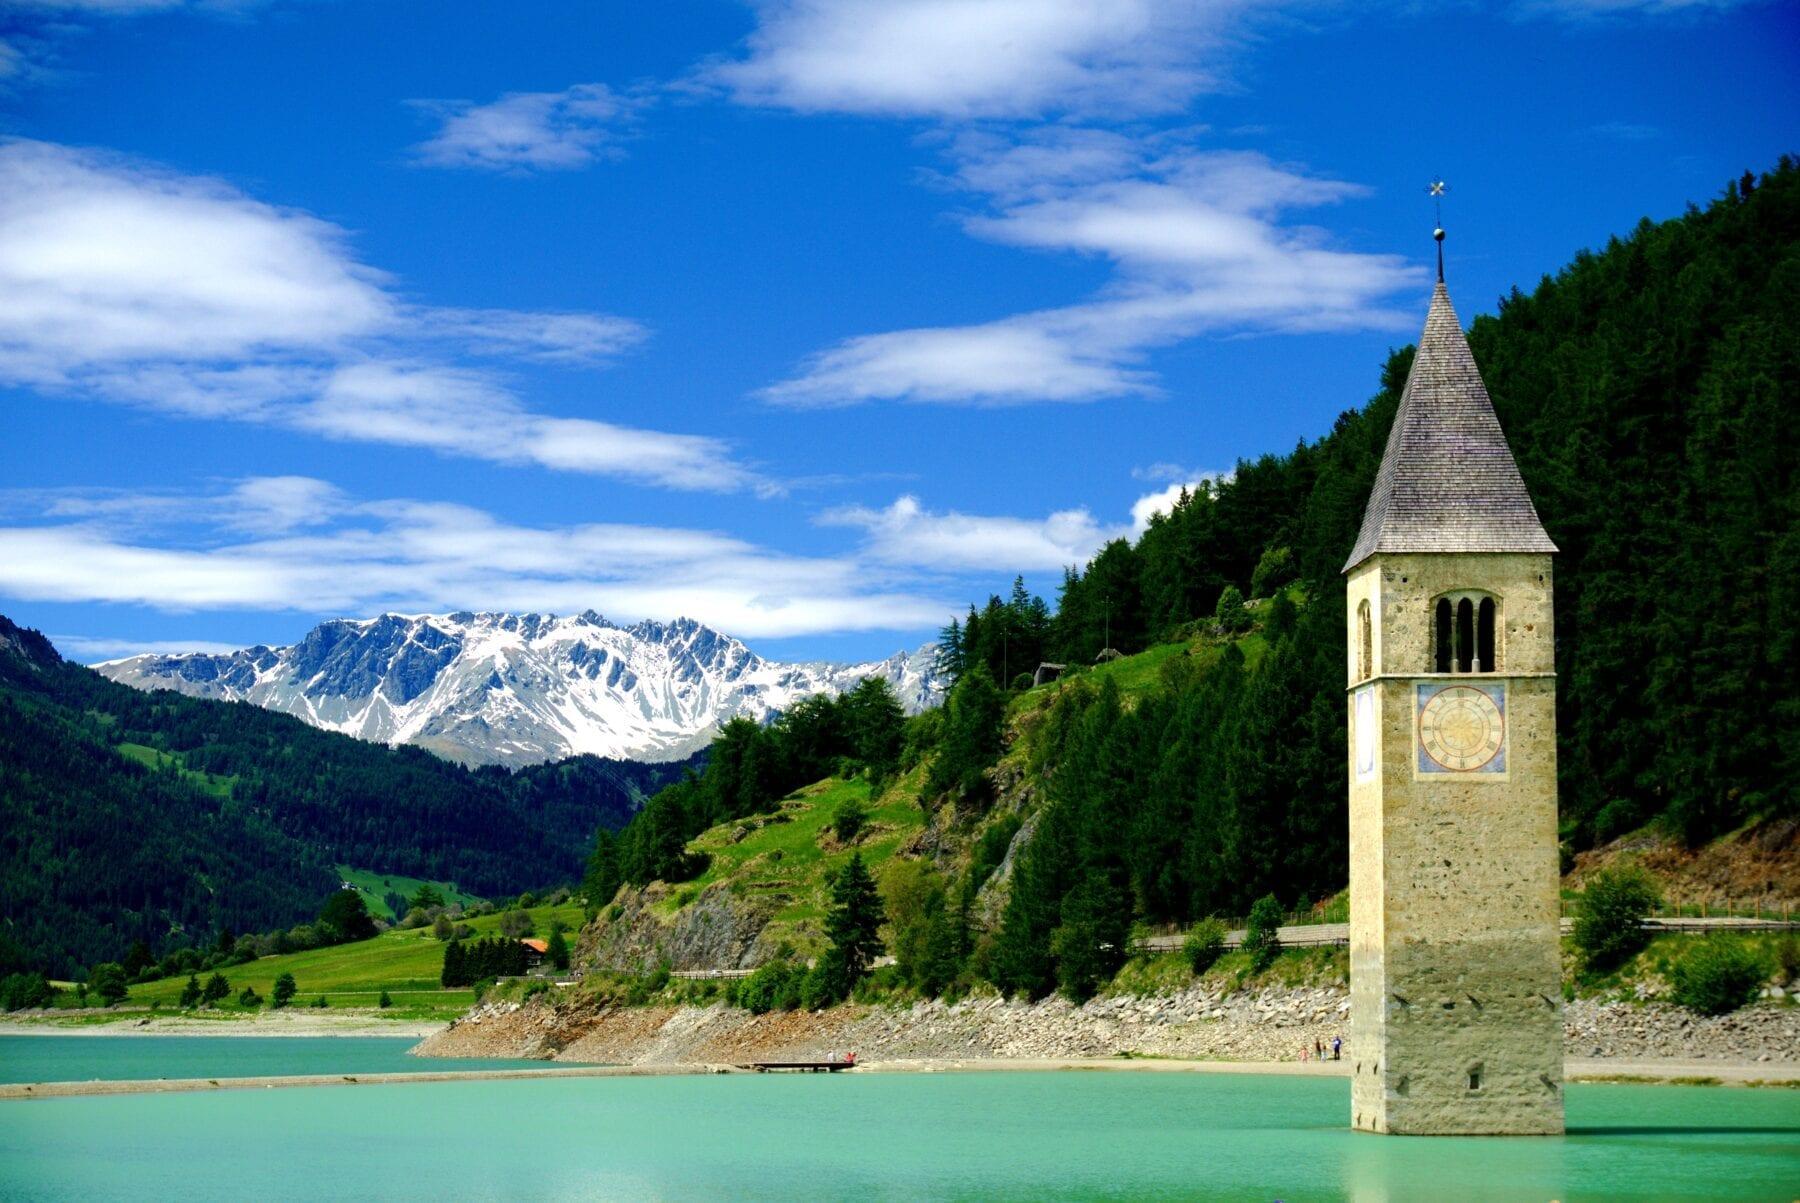 Meren in Zuid Tirol Reschensee